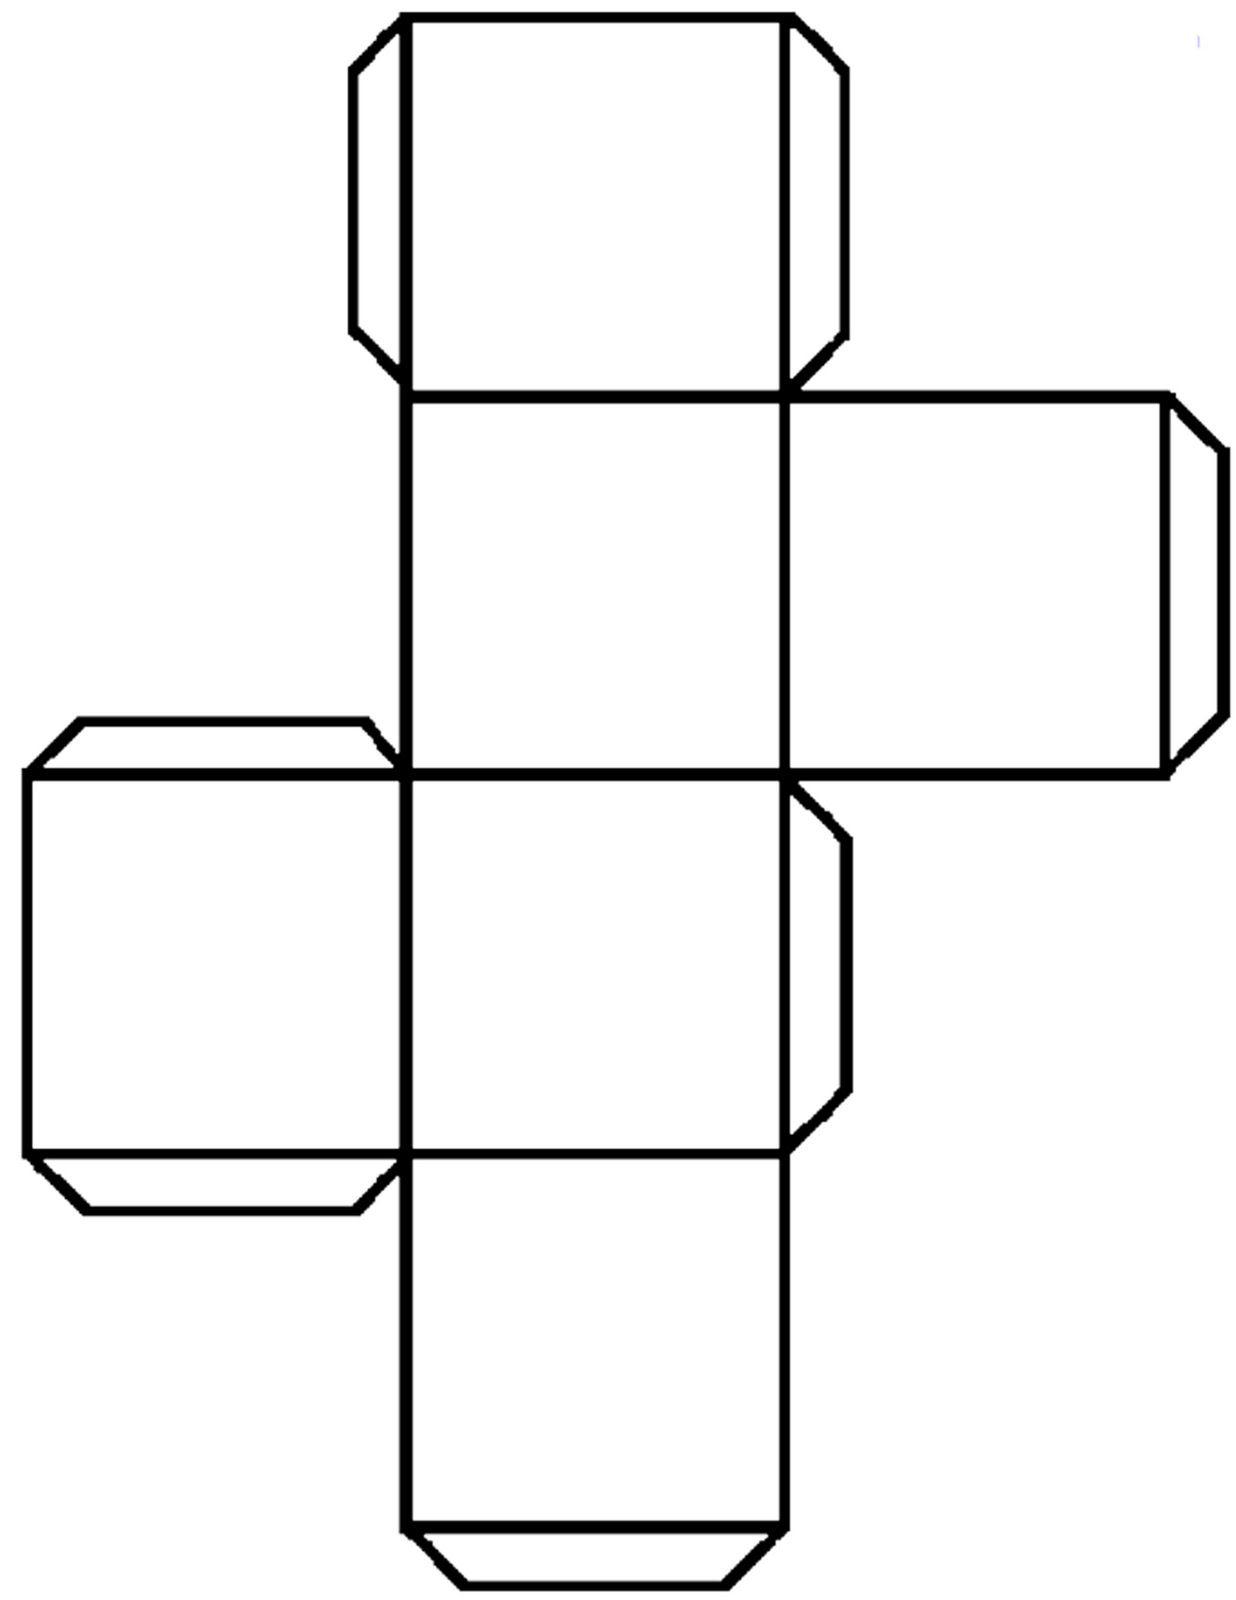 Gd1 Cube Template